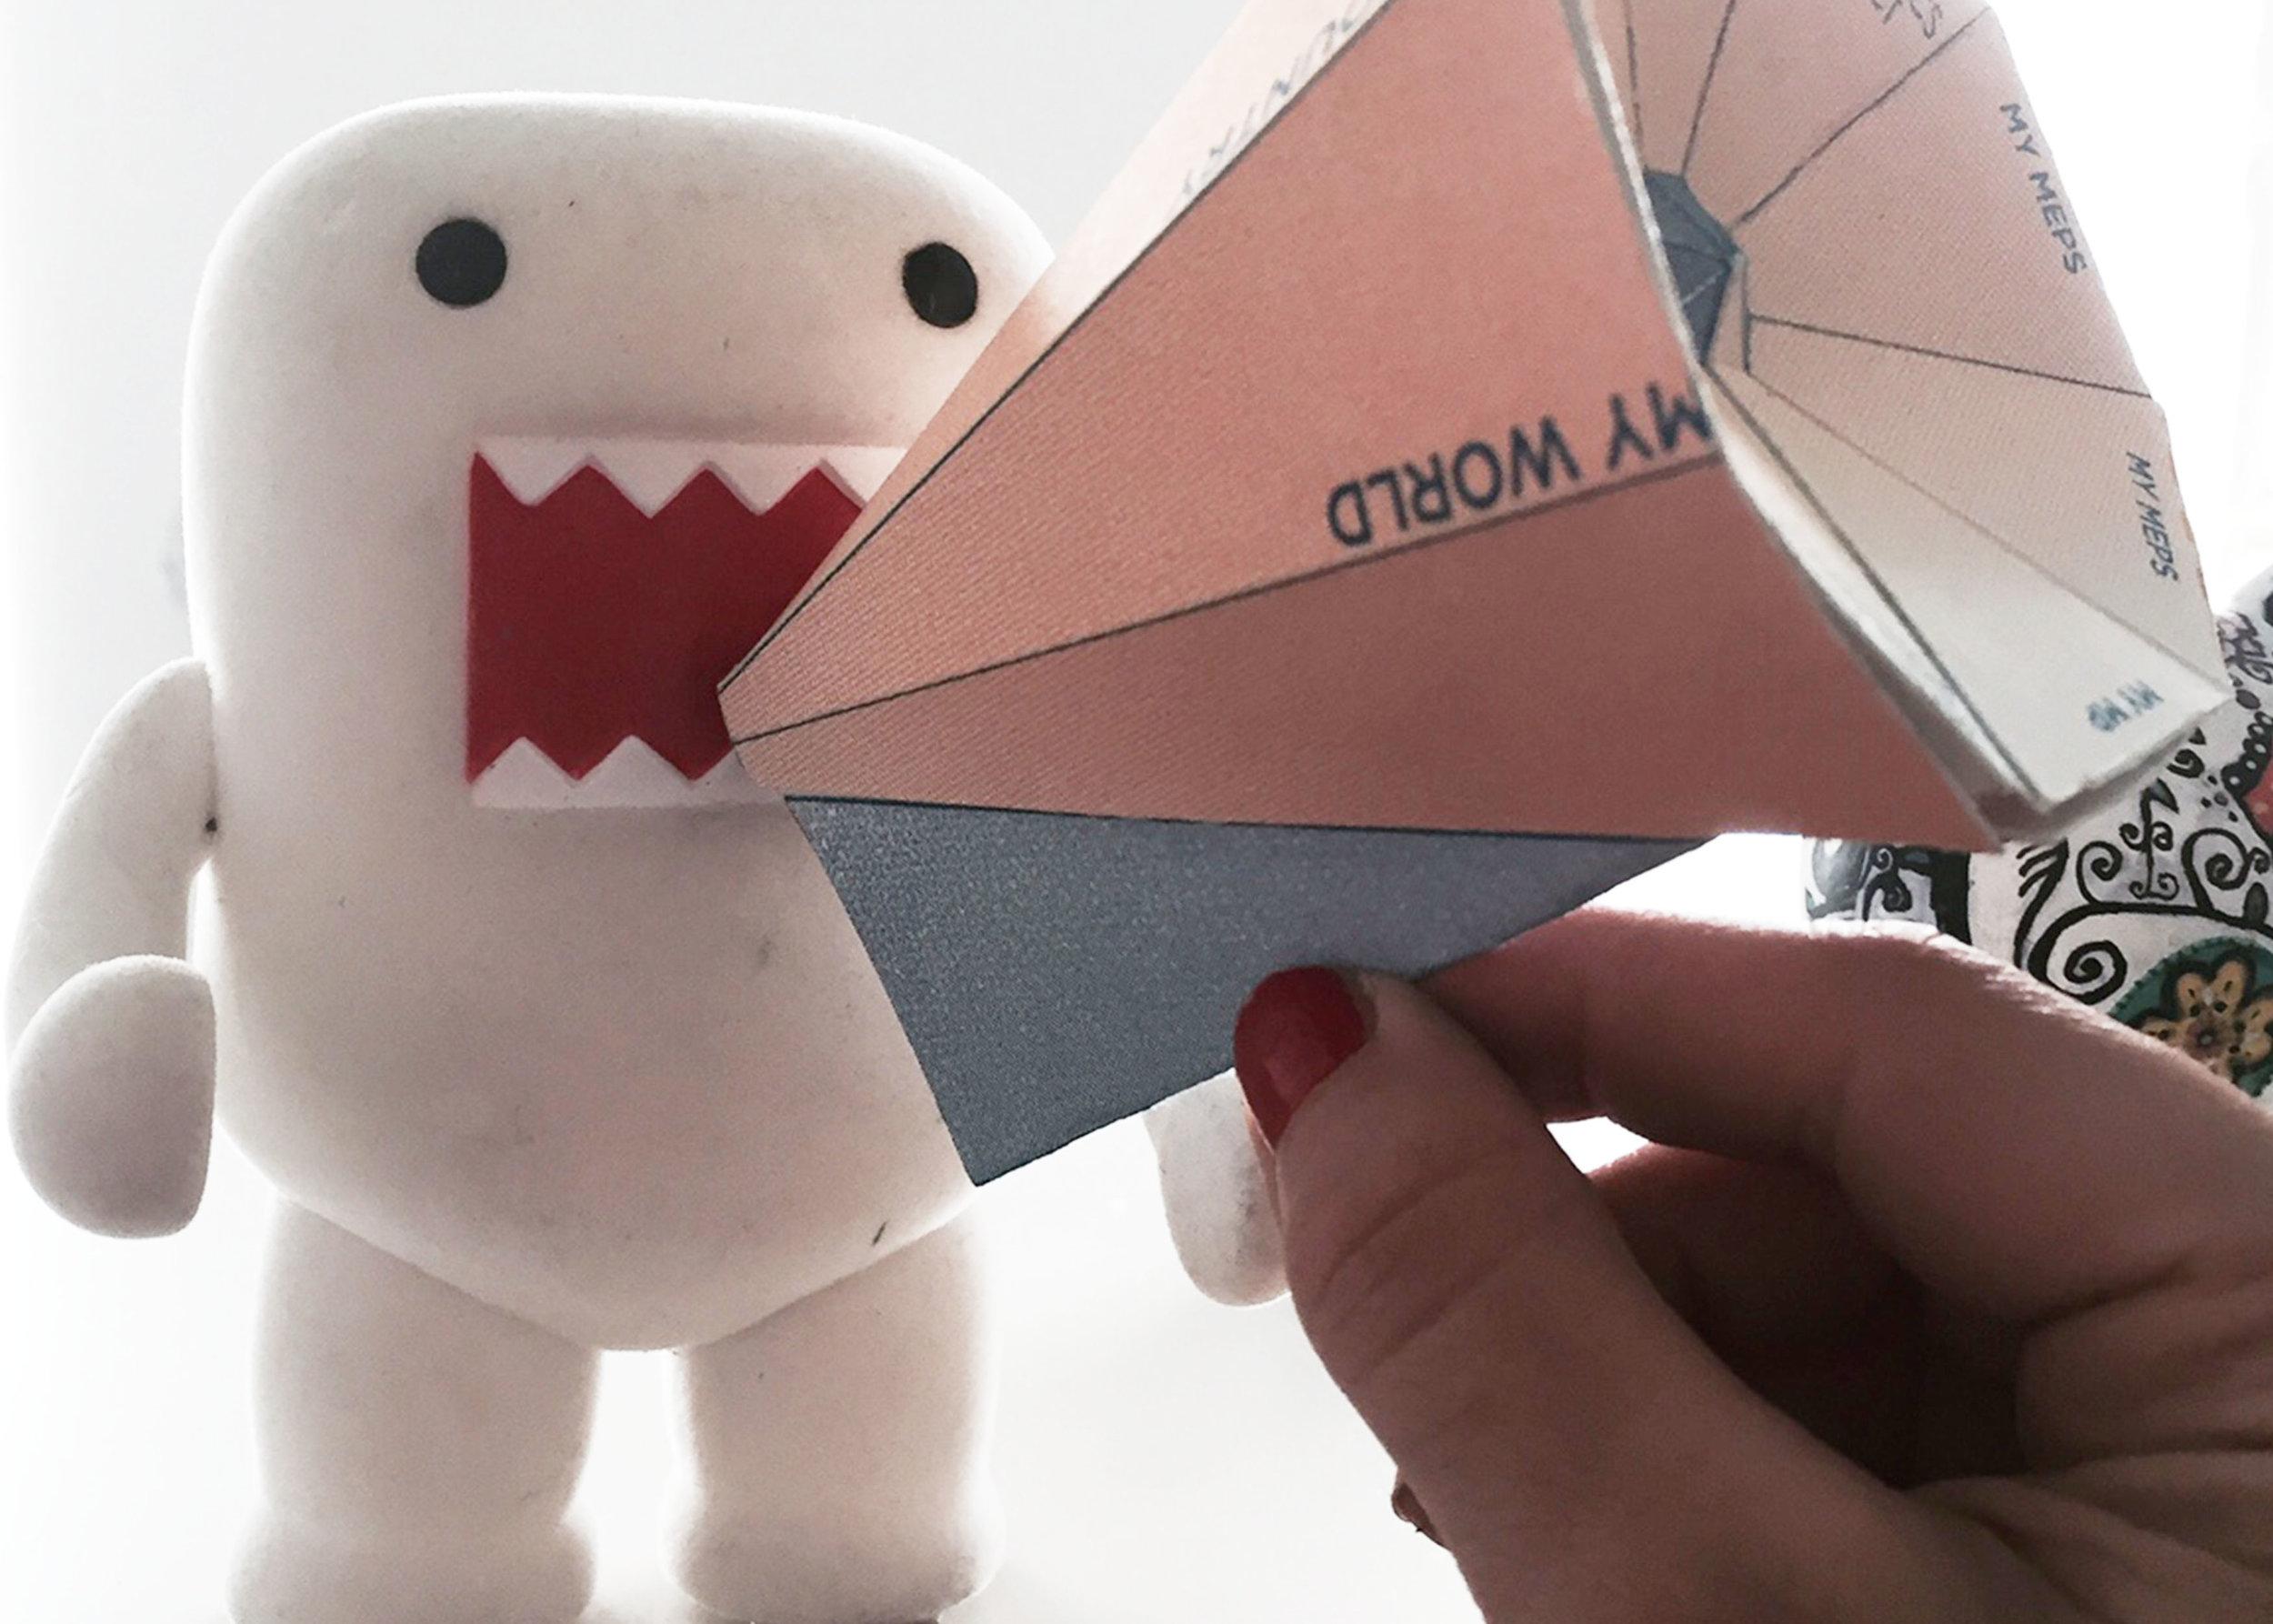 Bespoke Origami Speaker